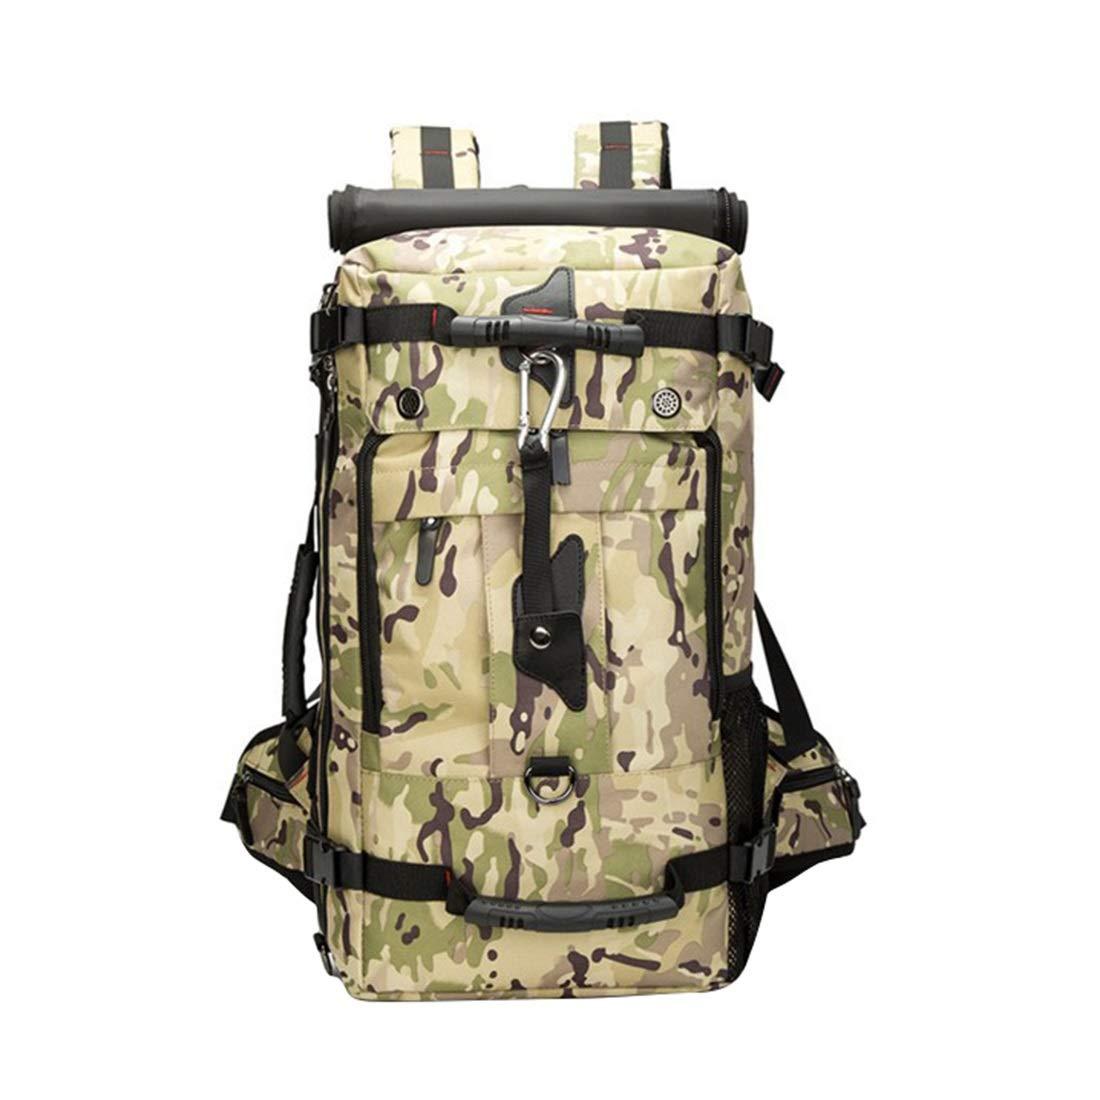 CAFUTY 登山バッグ、屋外用品、ショルダーバッグ、メンズトラベルバッグ、アウトドアスポーツバッグ、アウトドア用品。 (Color : 03)  3 B07MXF229M